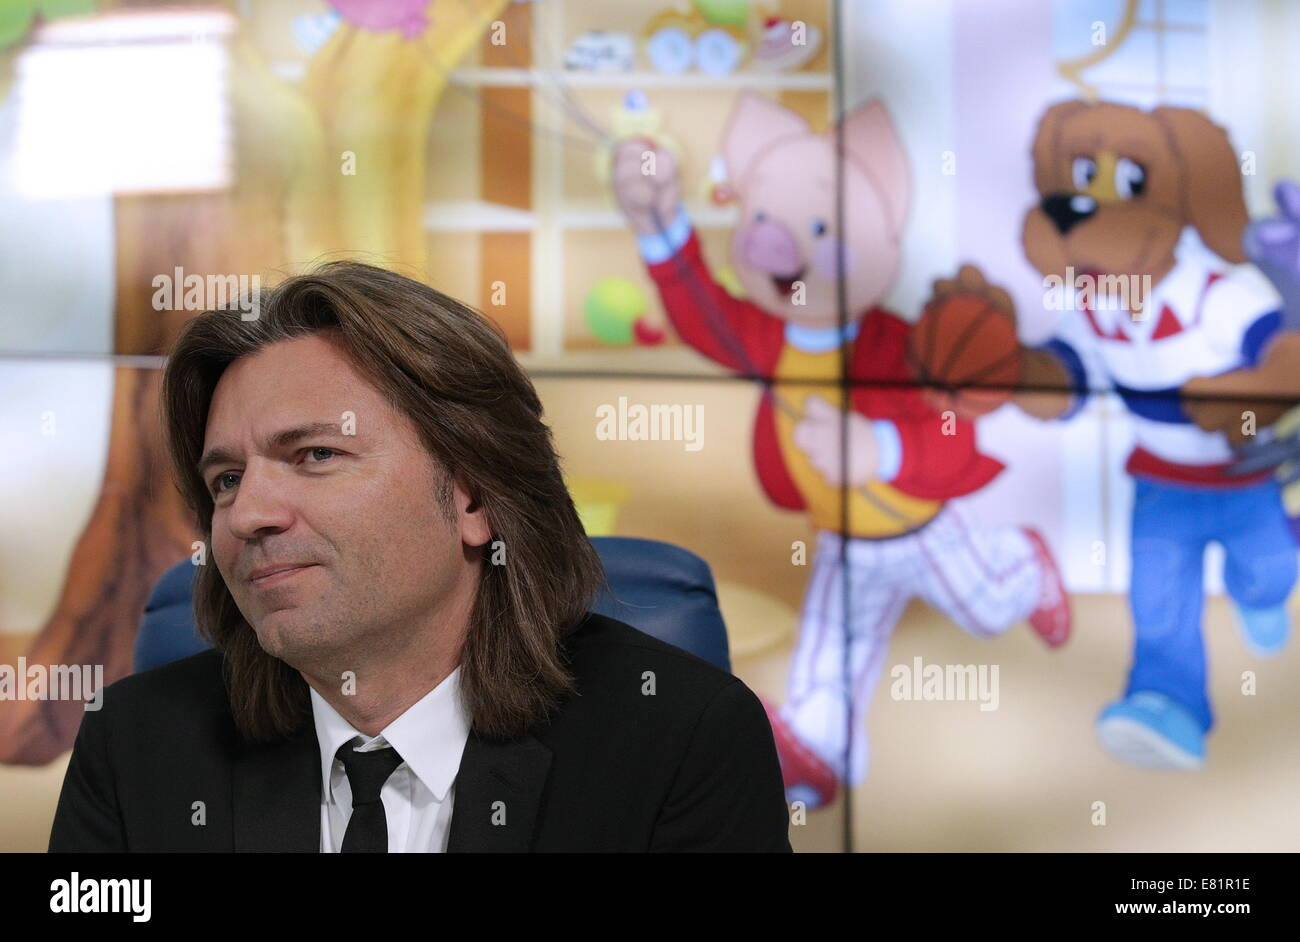 Malikov wants to raise his son a real man 21.02.2018 38